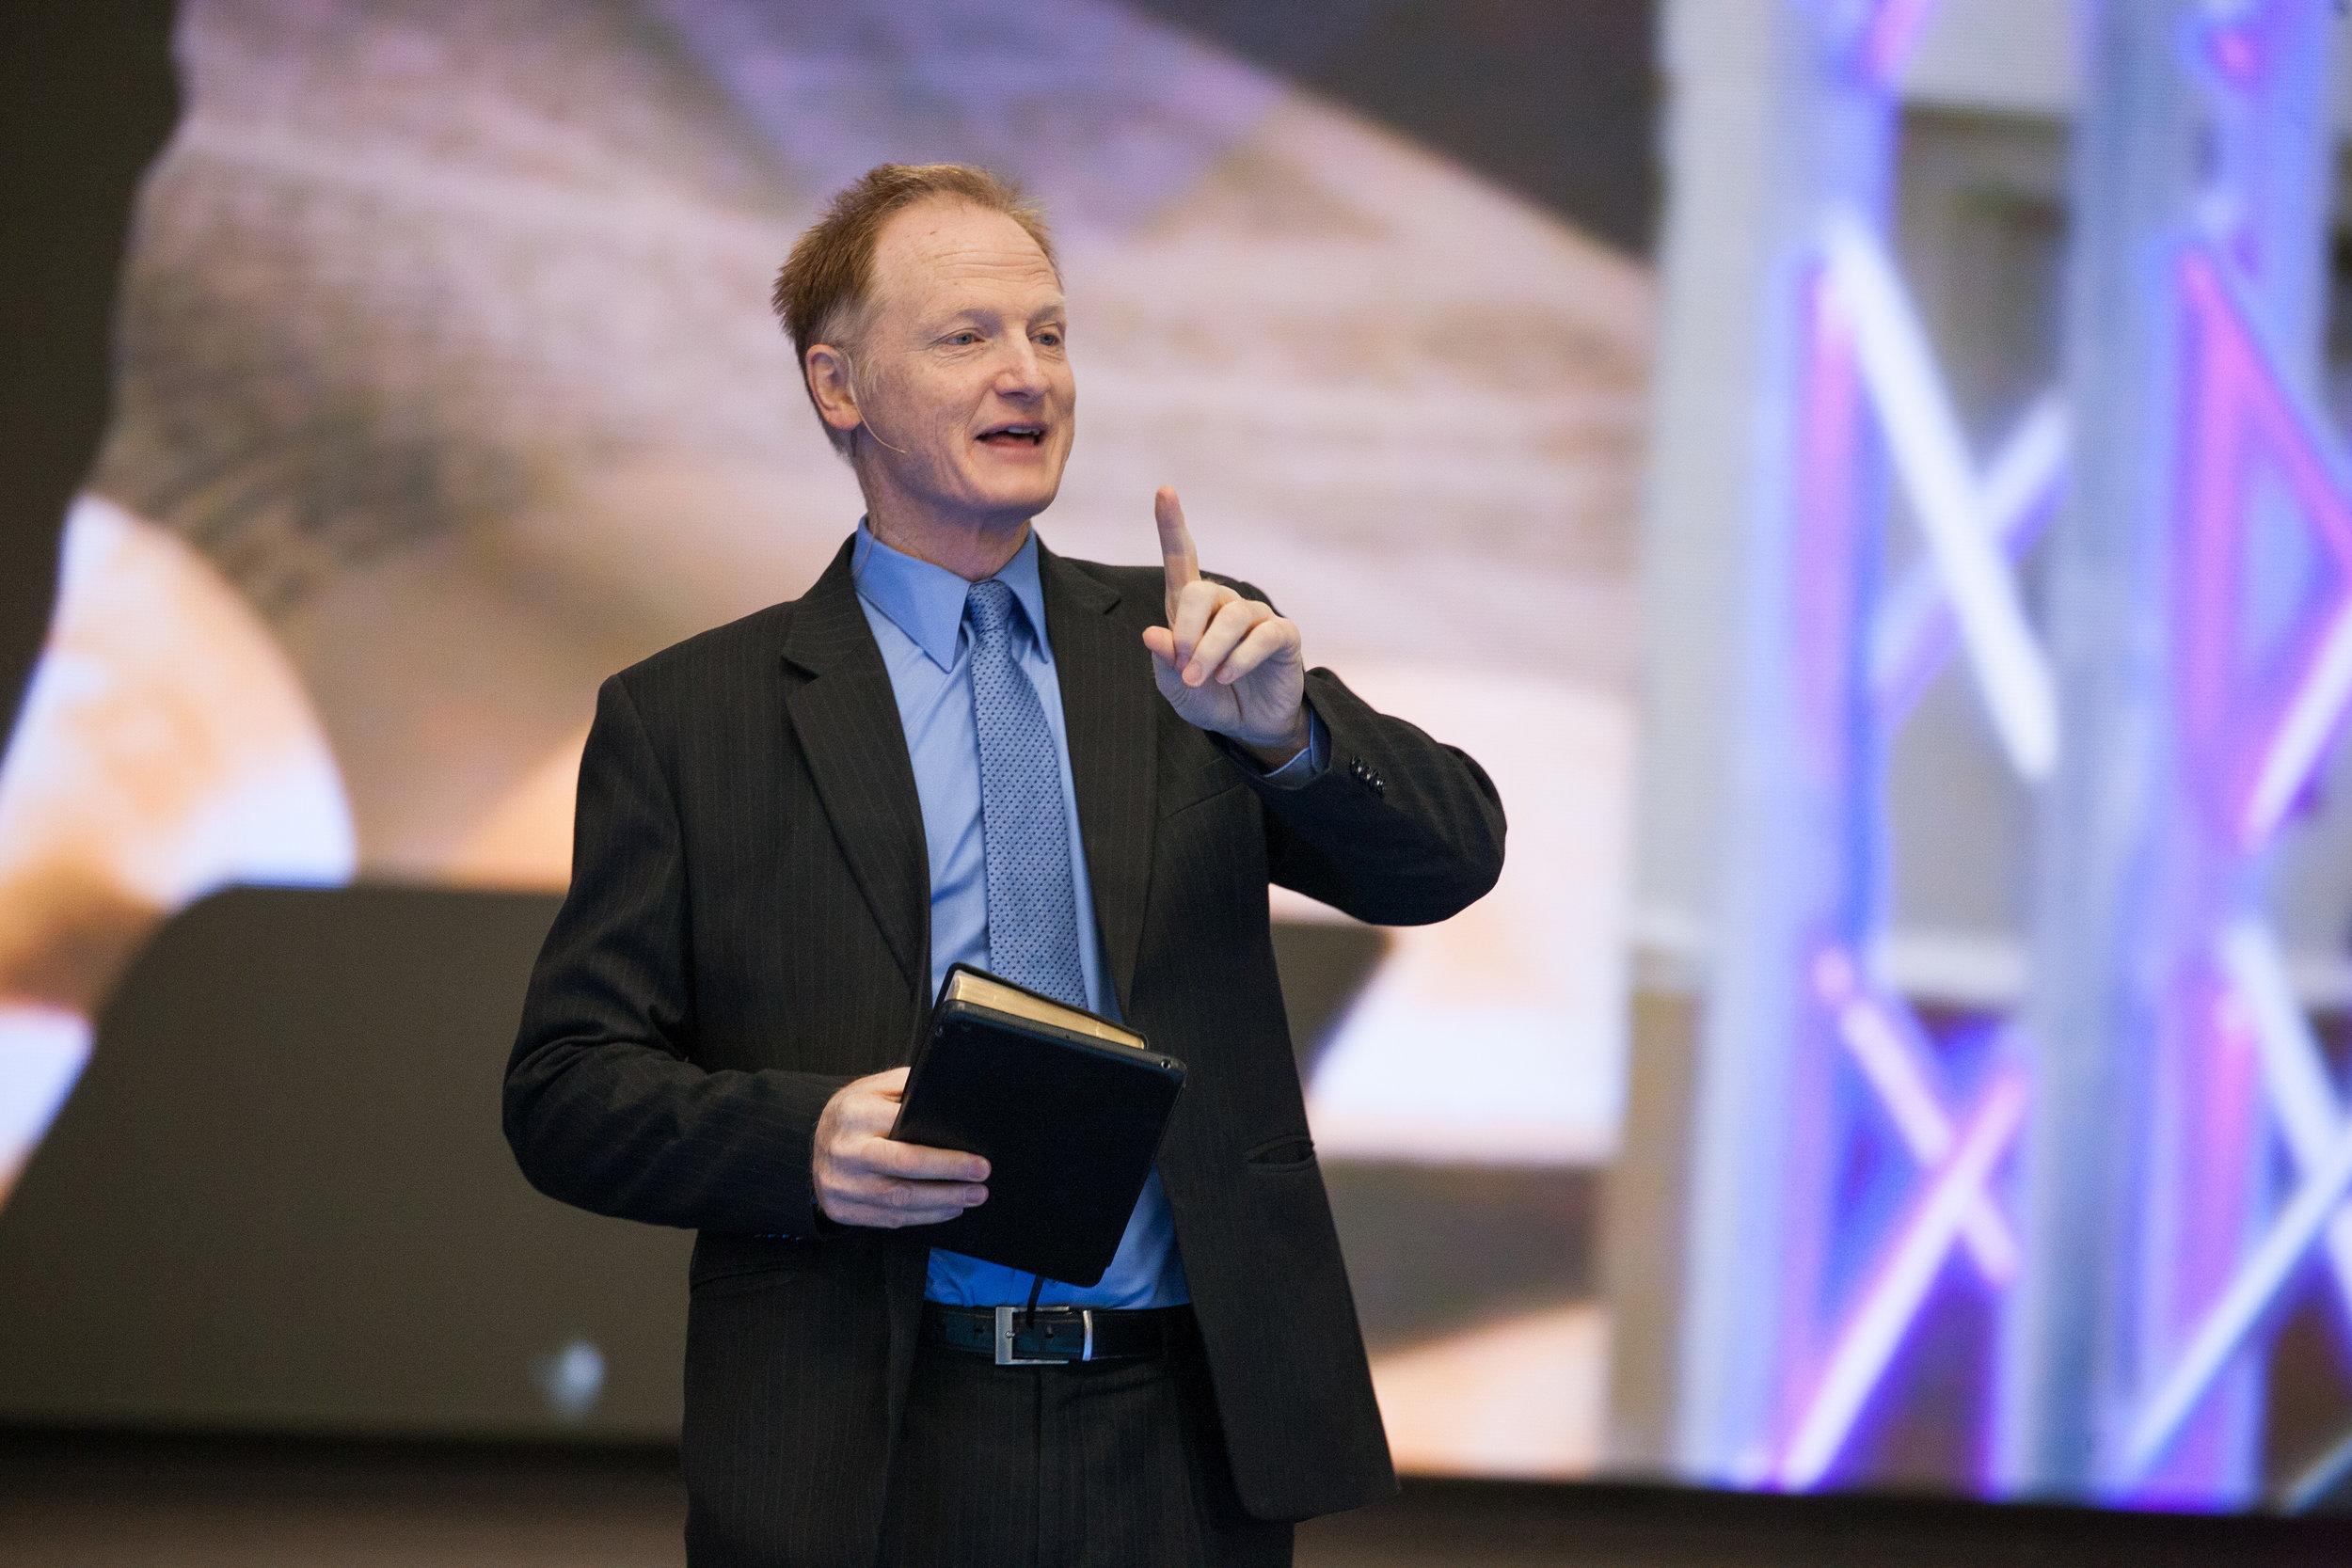 IIW Speaker/Director John Bradshaw preaches at the Reggie Lewis Center. Photo  by Joel Stapleton.